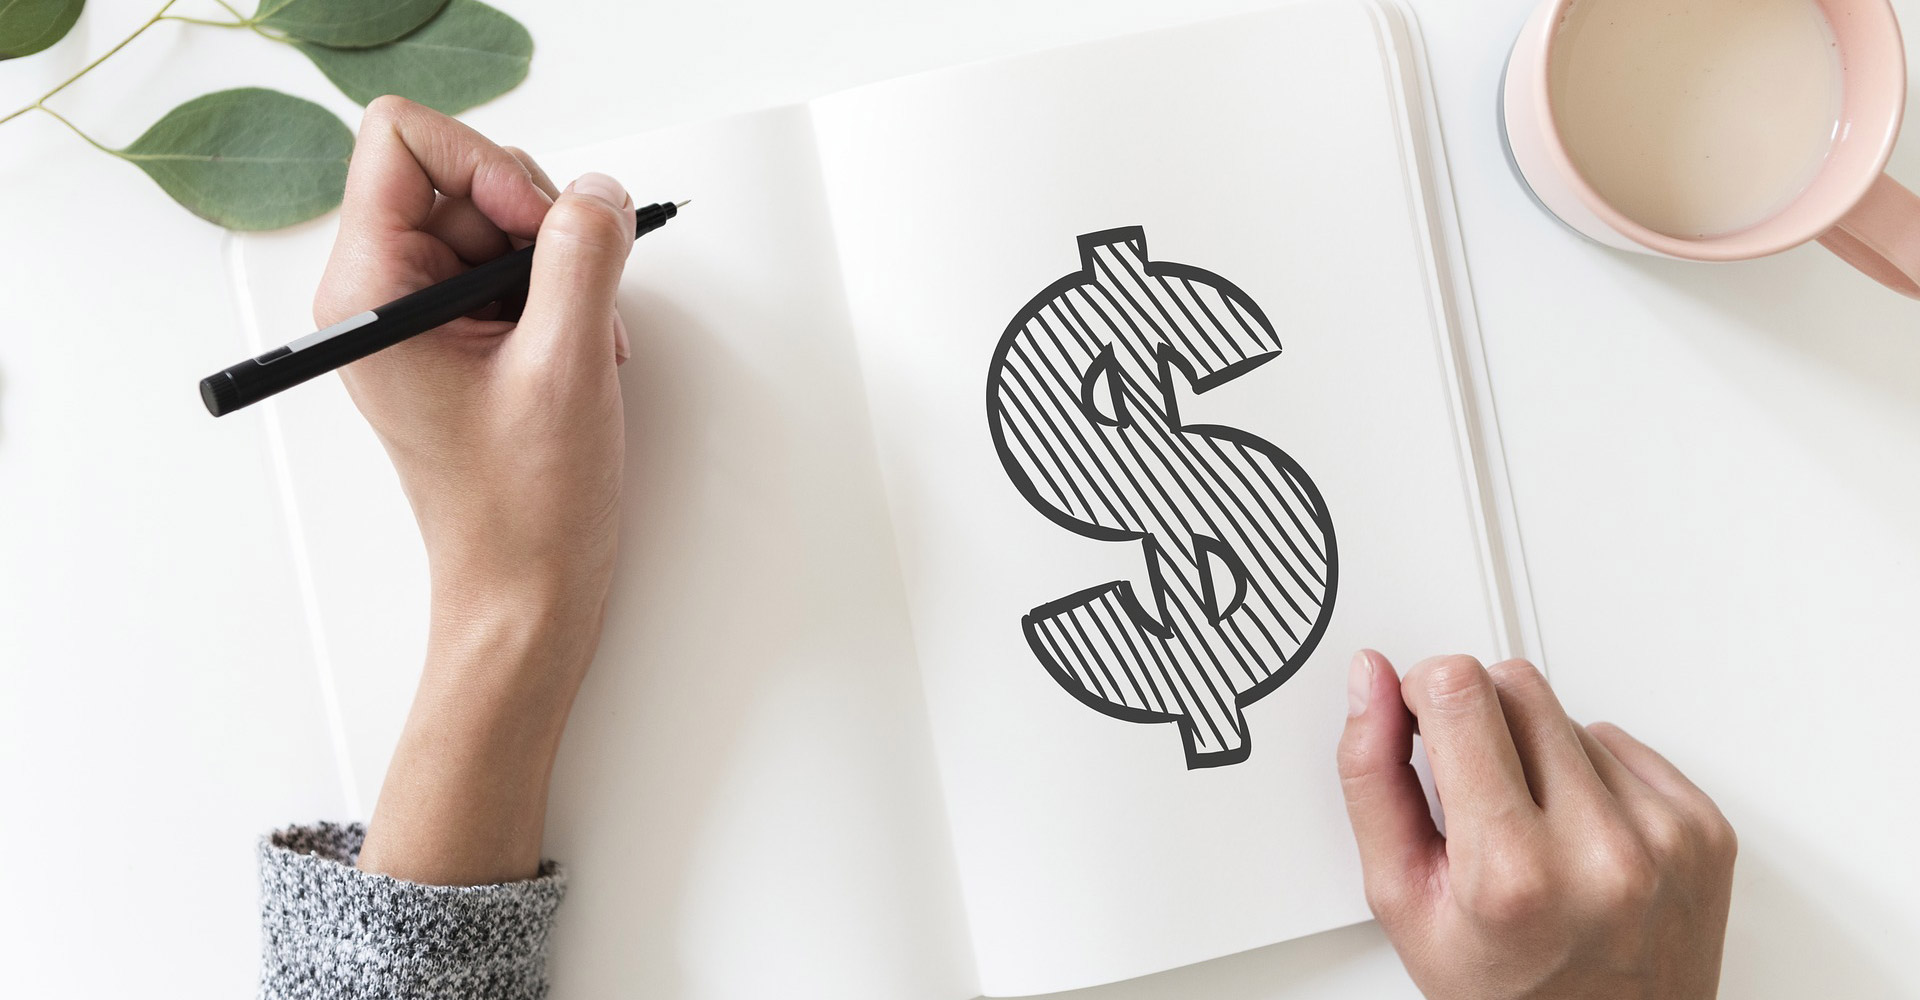 Measuring Success Through Author Income